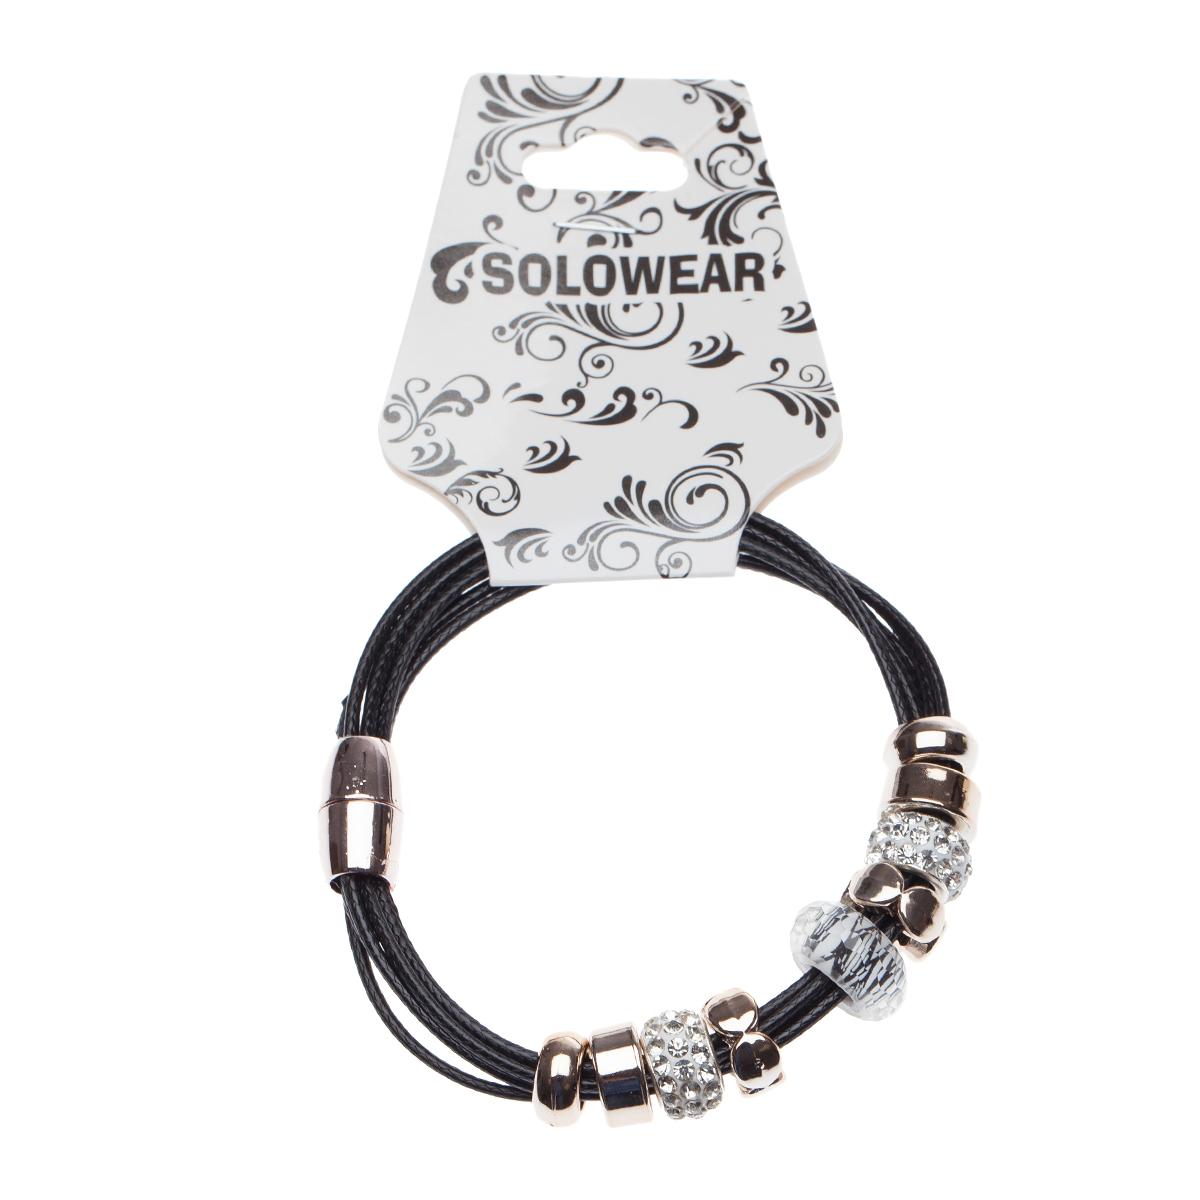 Браслет Solowear, 4620-5 браслет solowear 4620 7